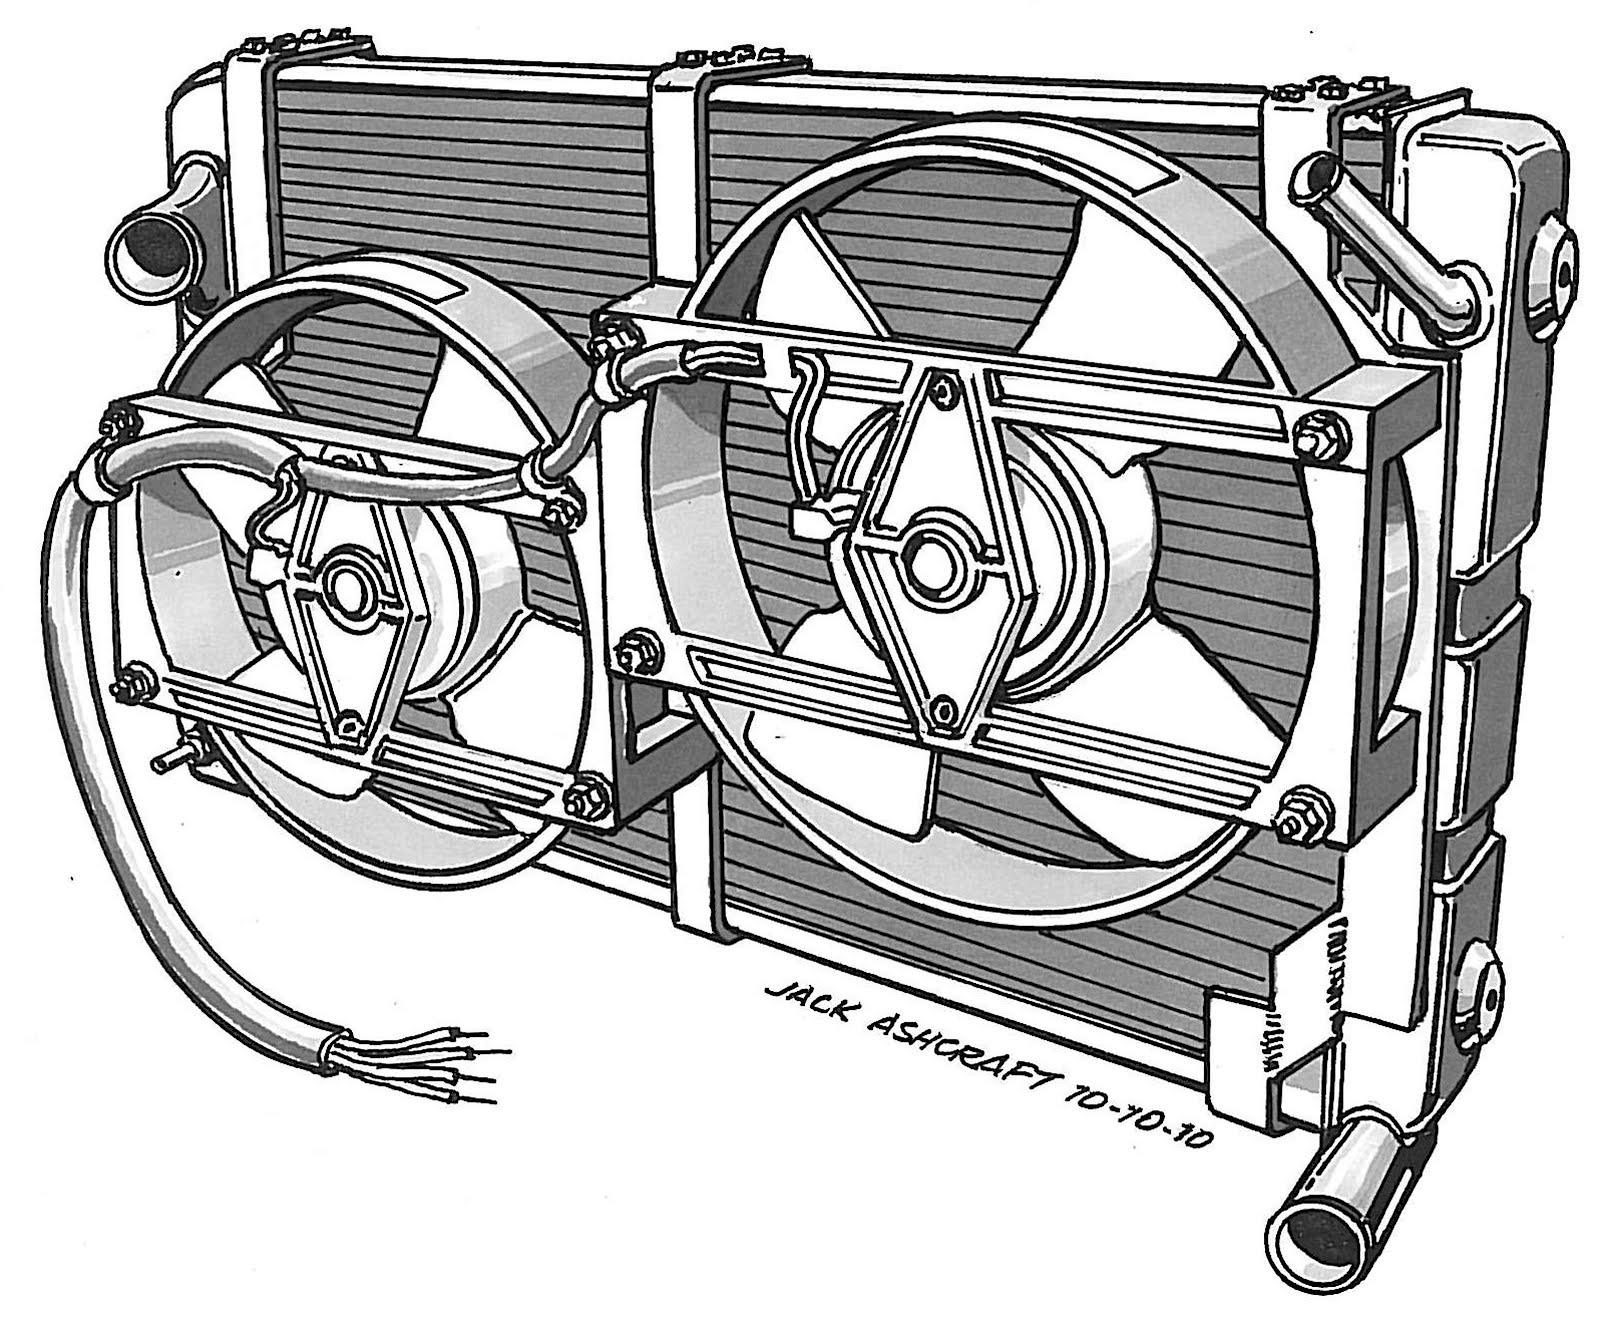 saab cooling system diagram on vdo sdometer wiring diagram [ 1600 x 1328 Pixel ]